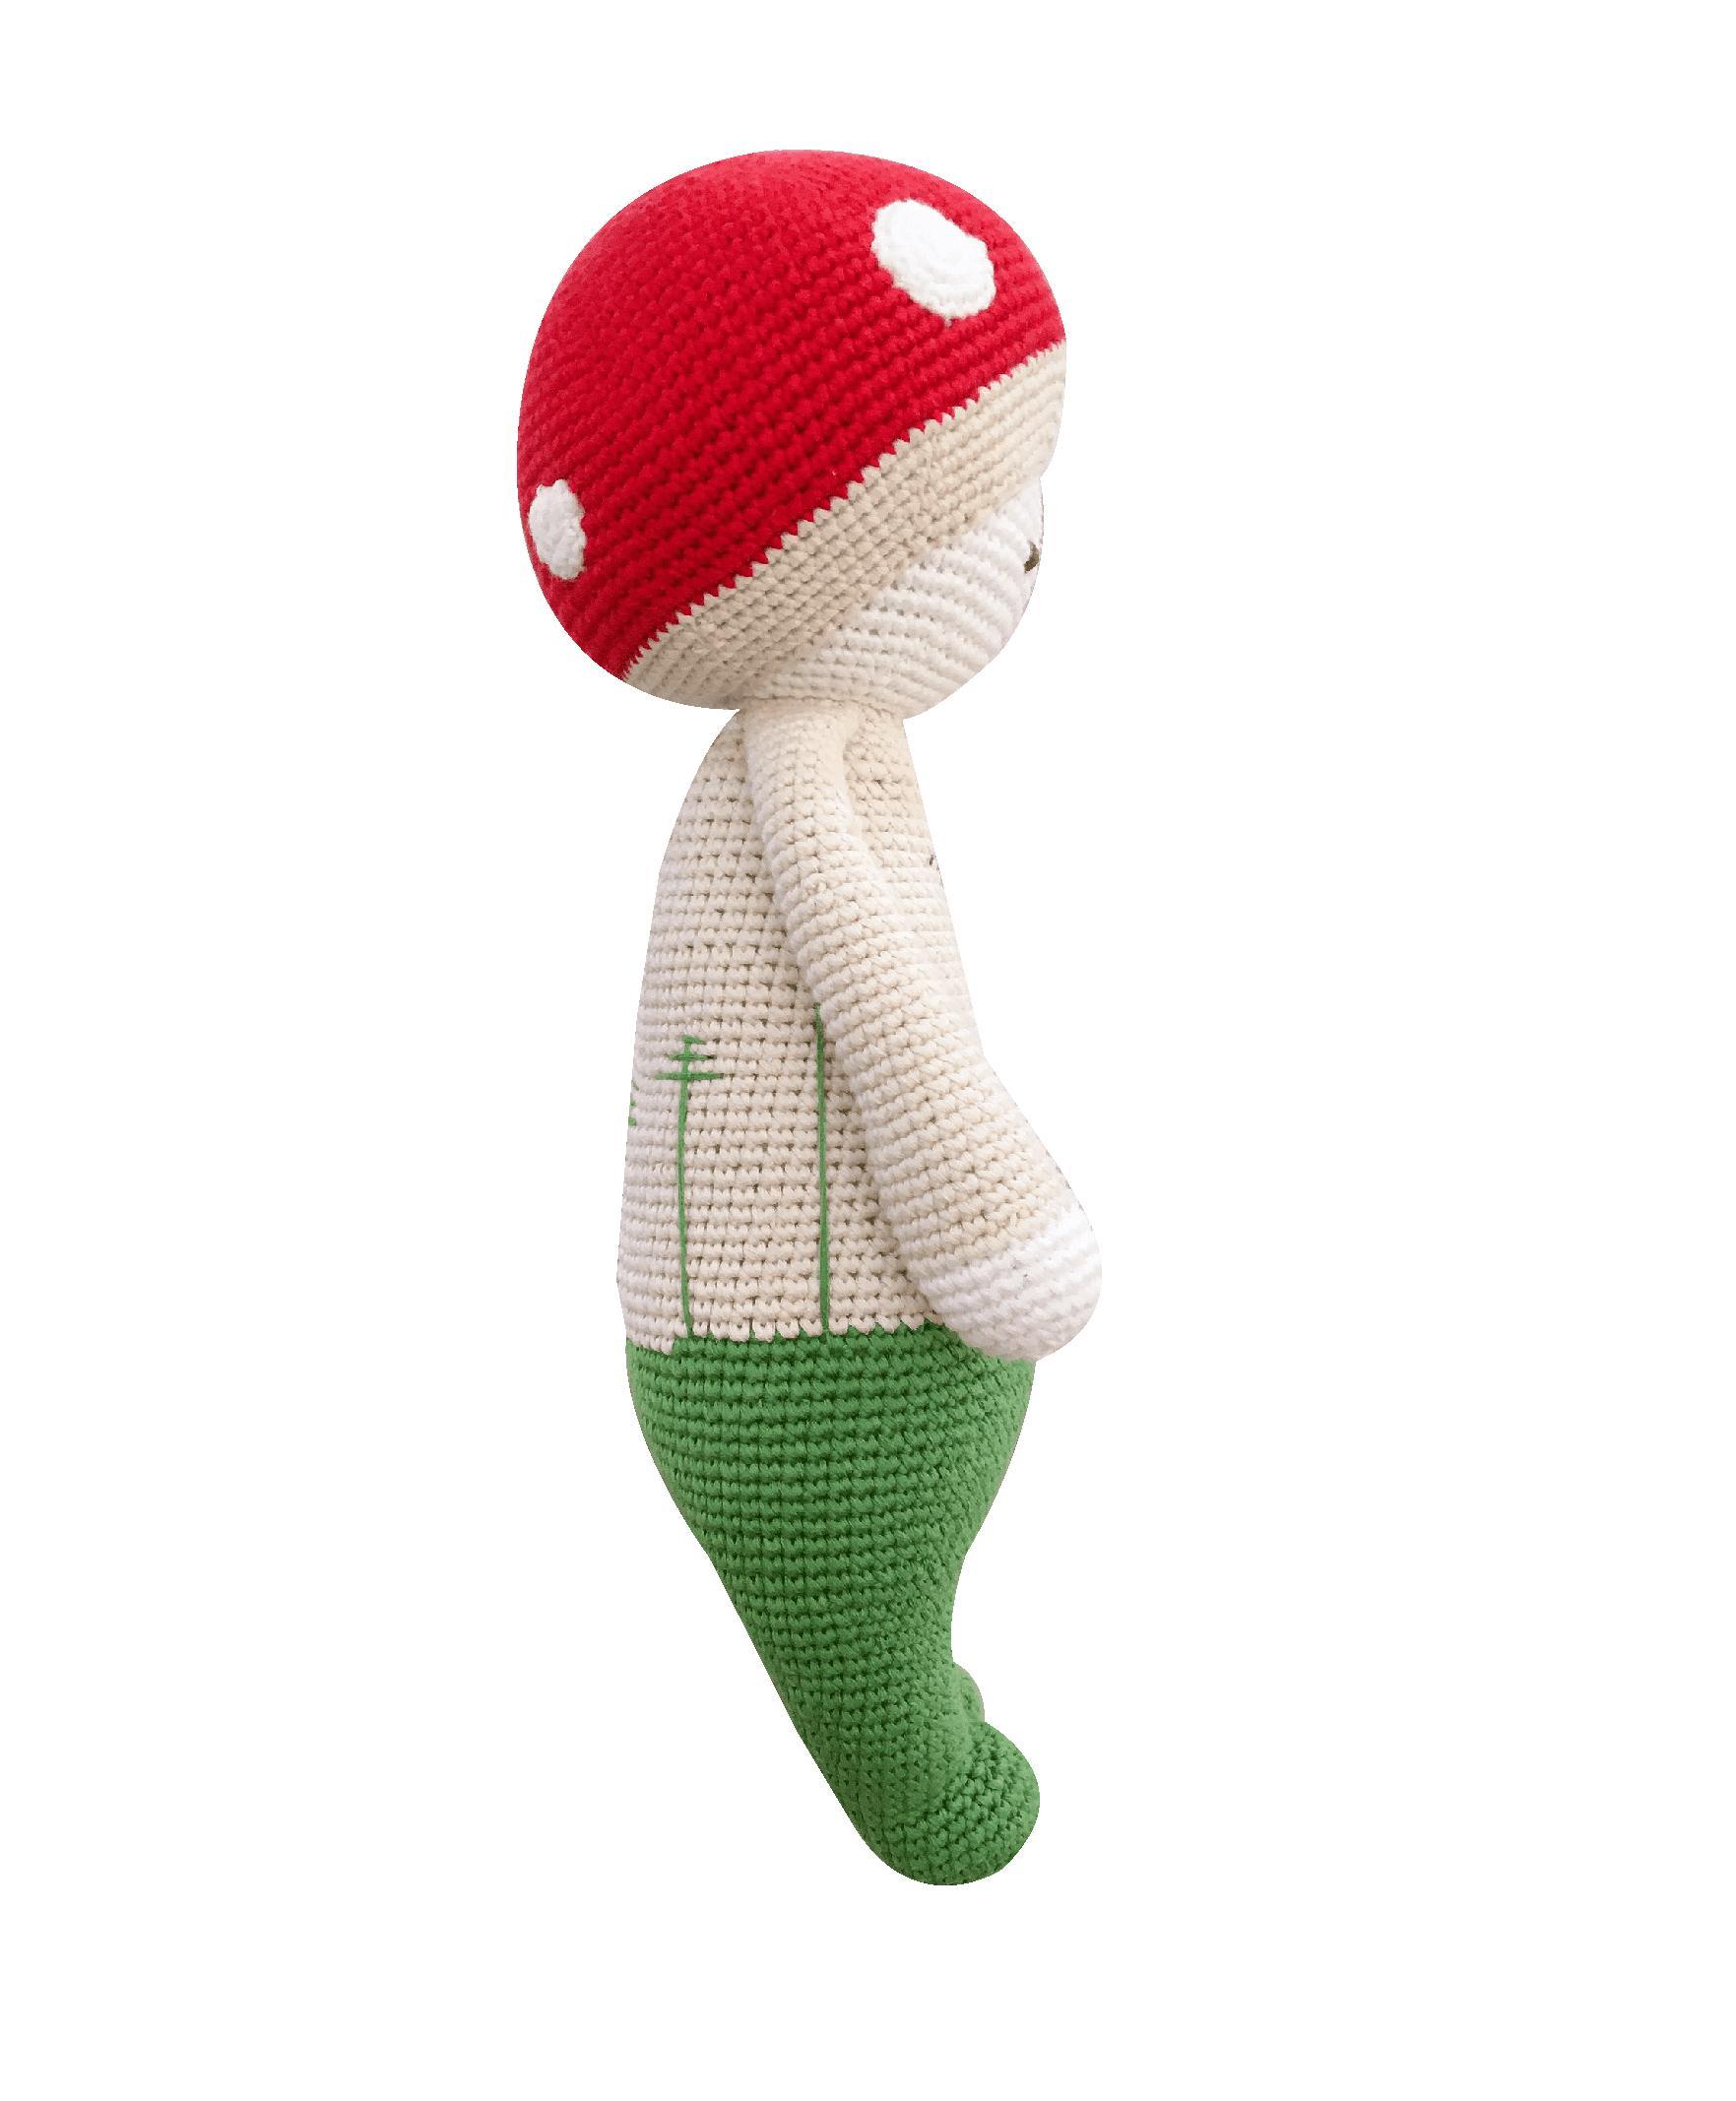 Mario Boy Mushroom